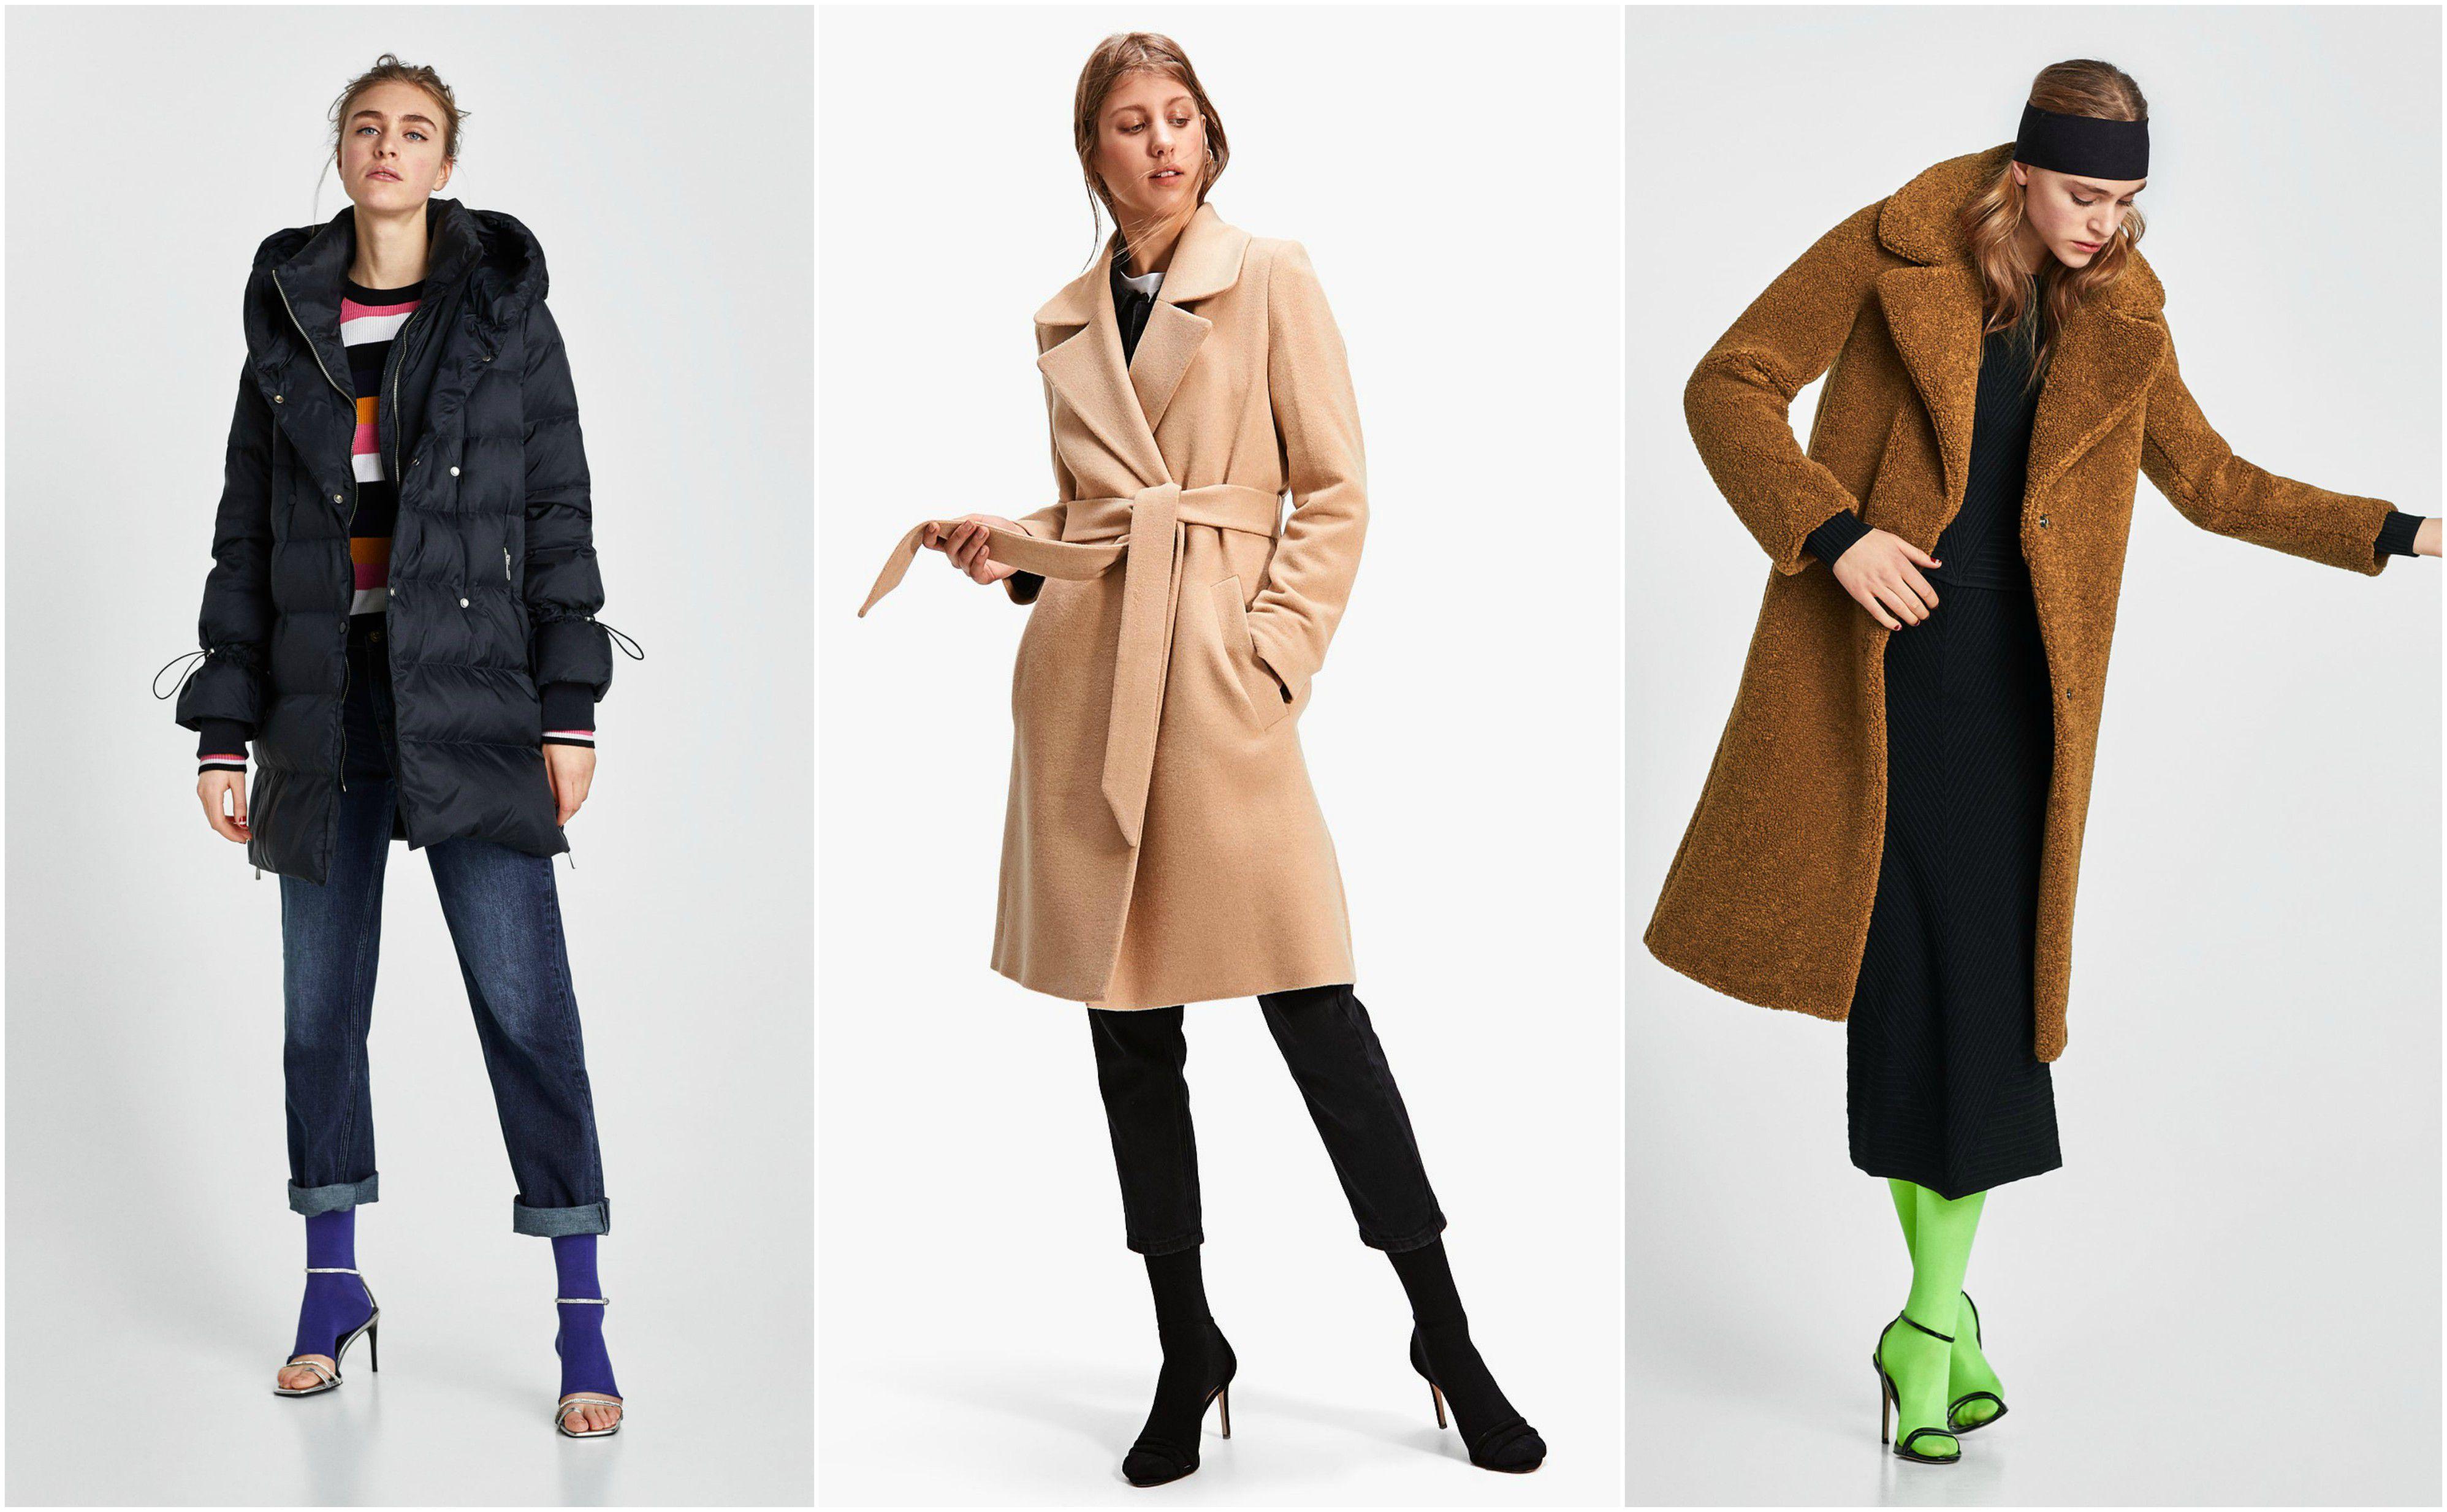 Zima je očito tek počela, pa evo najljepših debelih jakni iz ponude!